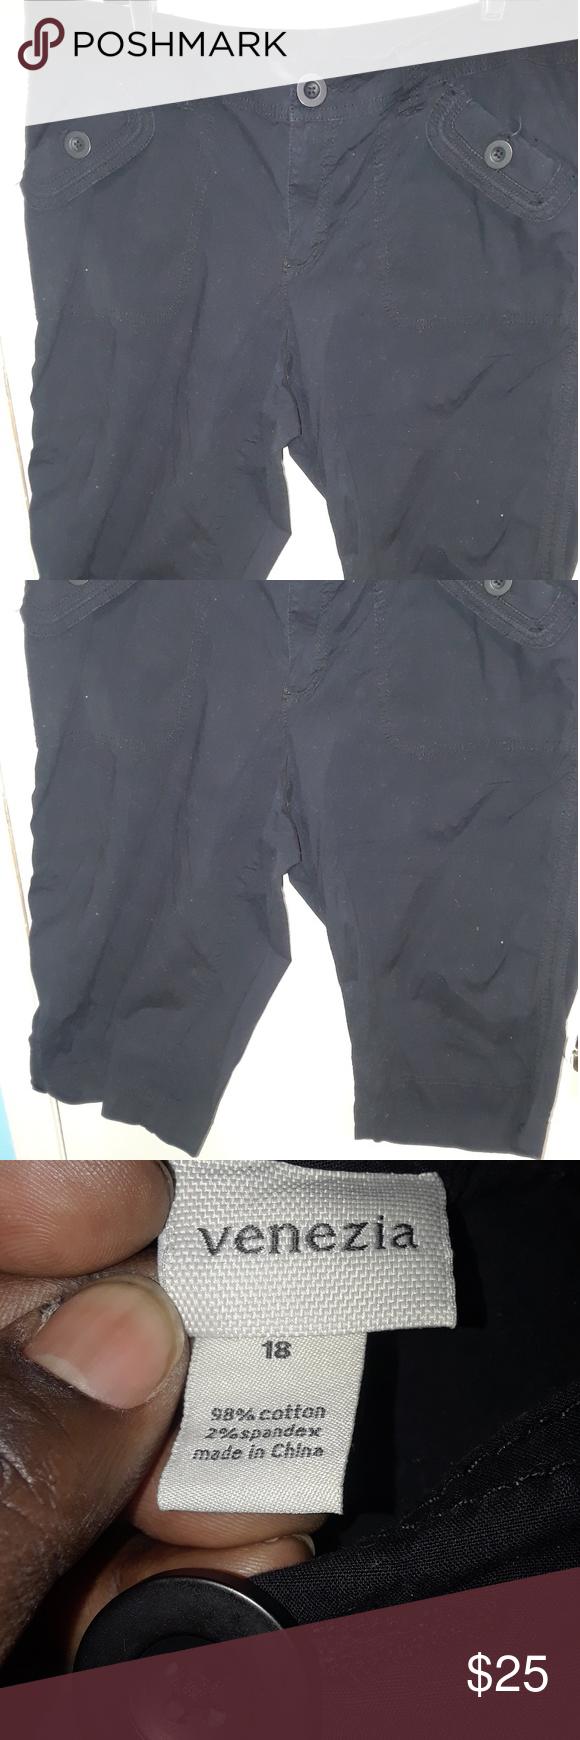 Venezia Shorts Clothes Design Shorts Things To Sell